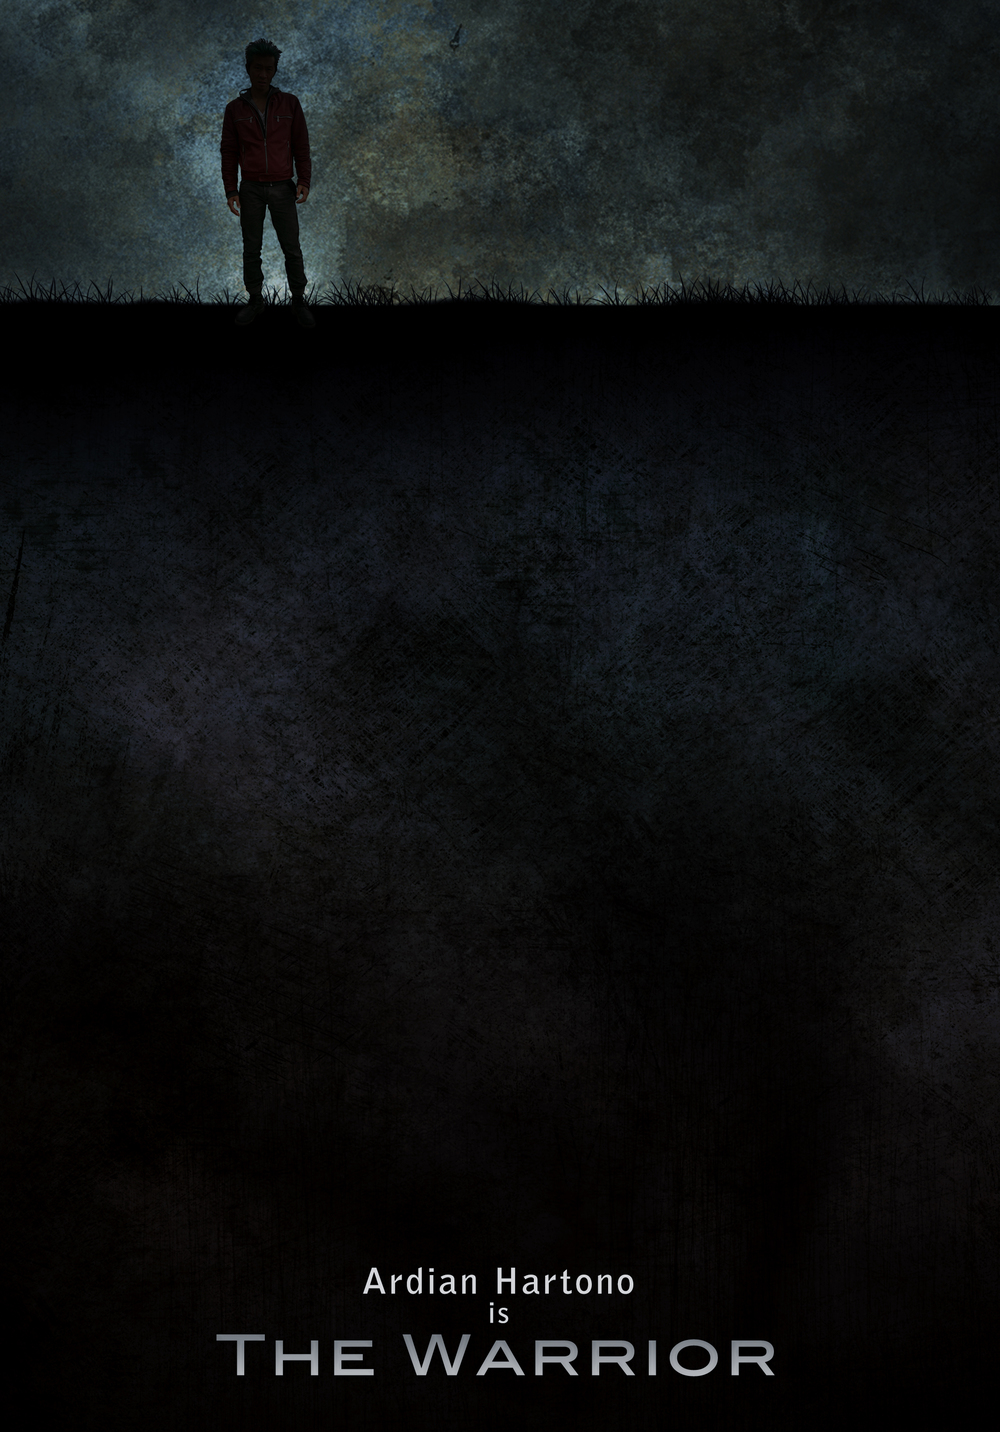 Ardian-poster4_01.jpg